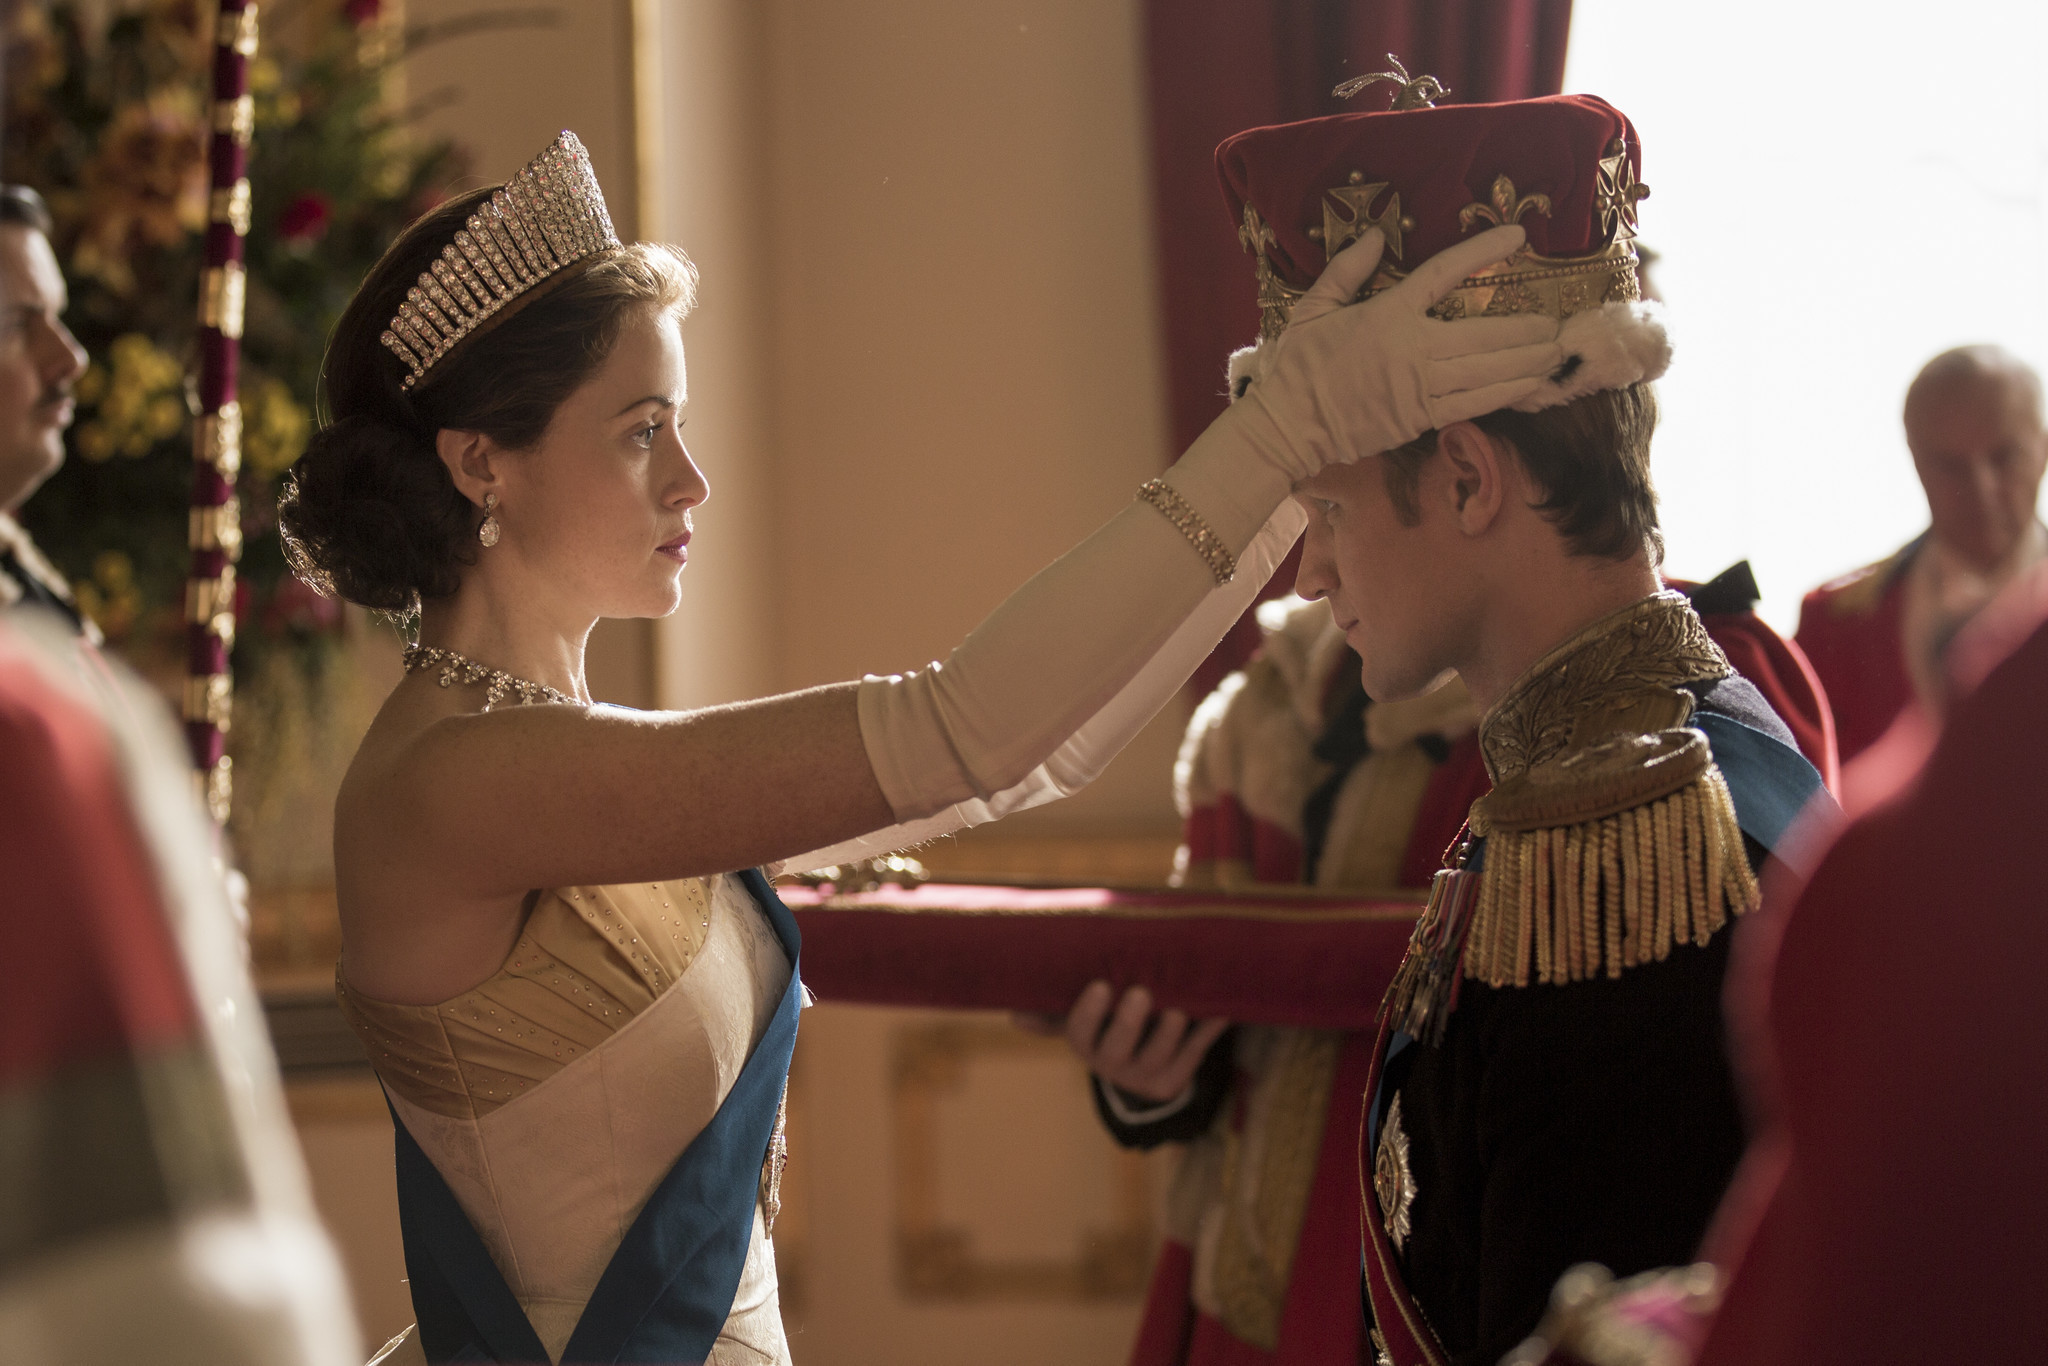 queen elizabeth ii faces humiliation and scandal in 39 the crown 39 season 2 trailer la times. Black Bedroom Furniture Sets. Home Design Ideas